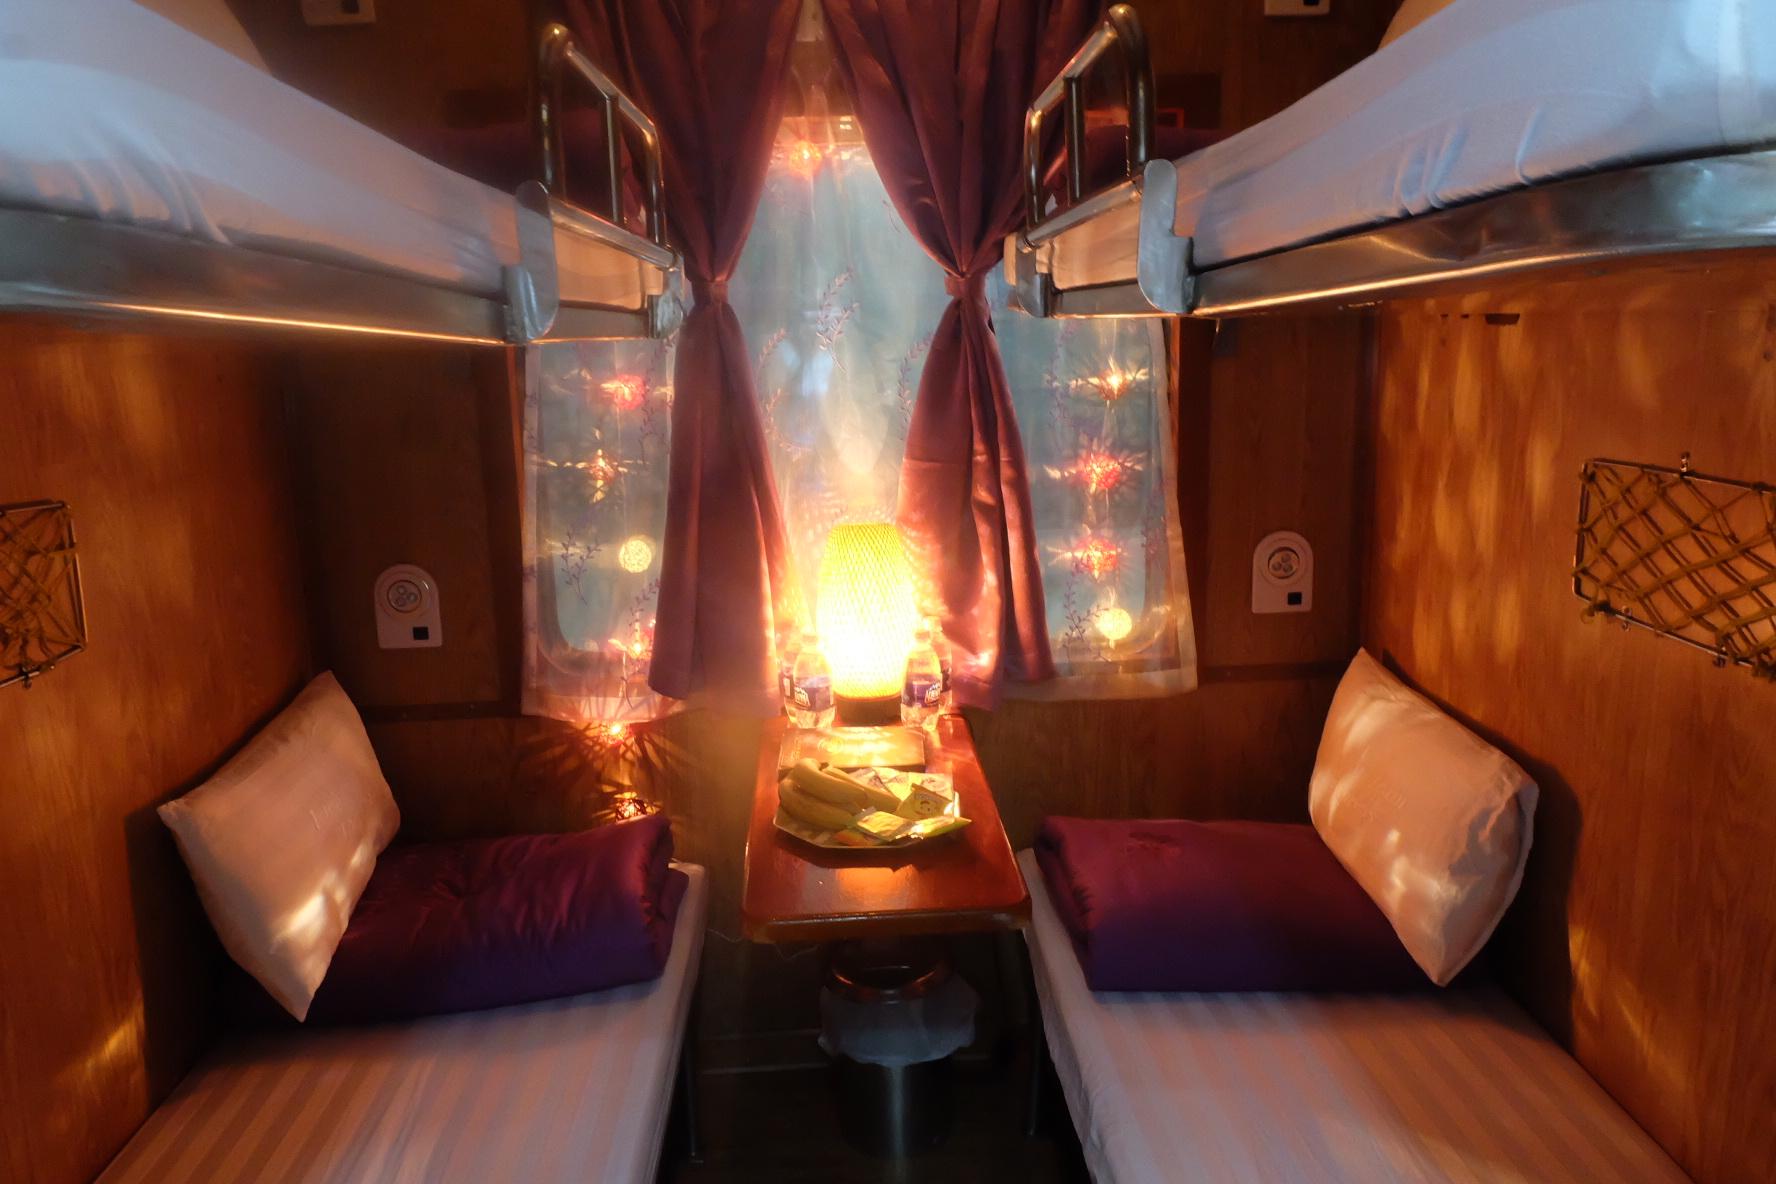 train-sapa-hanoi-luxe-cozy-blog.JPG